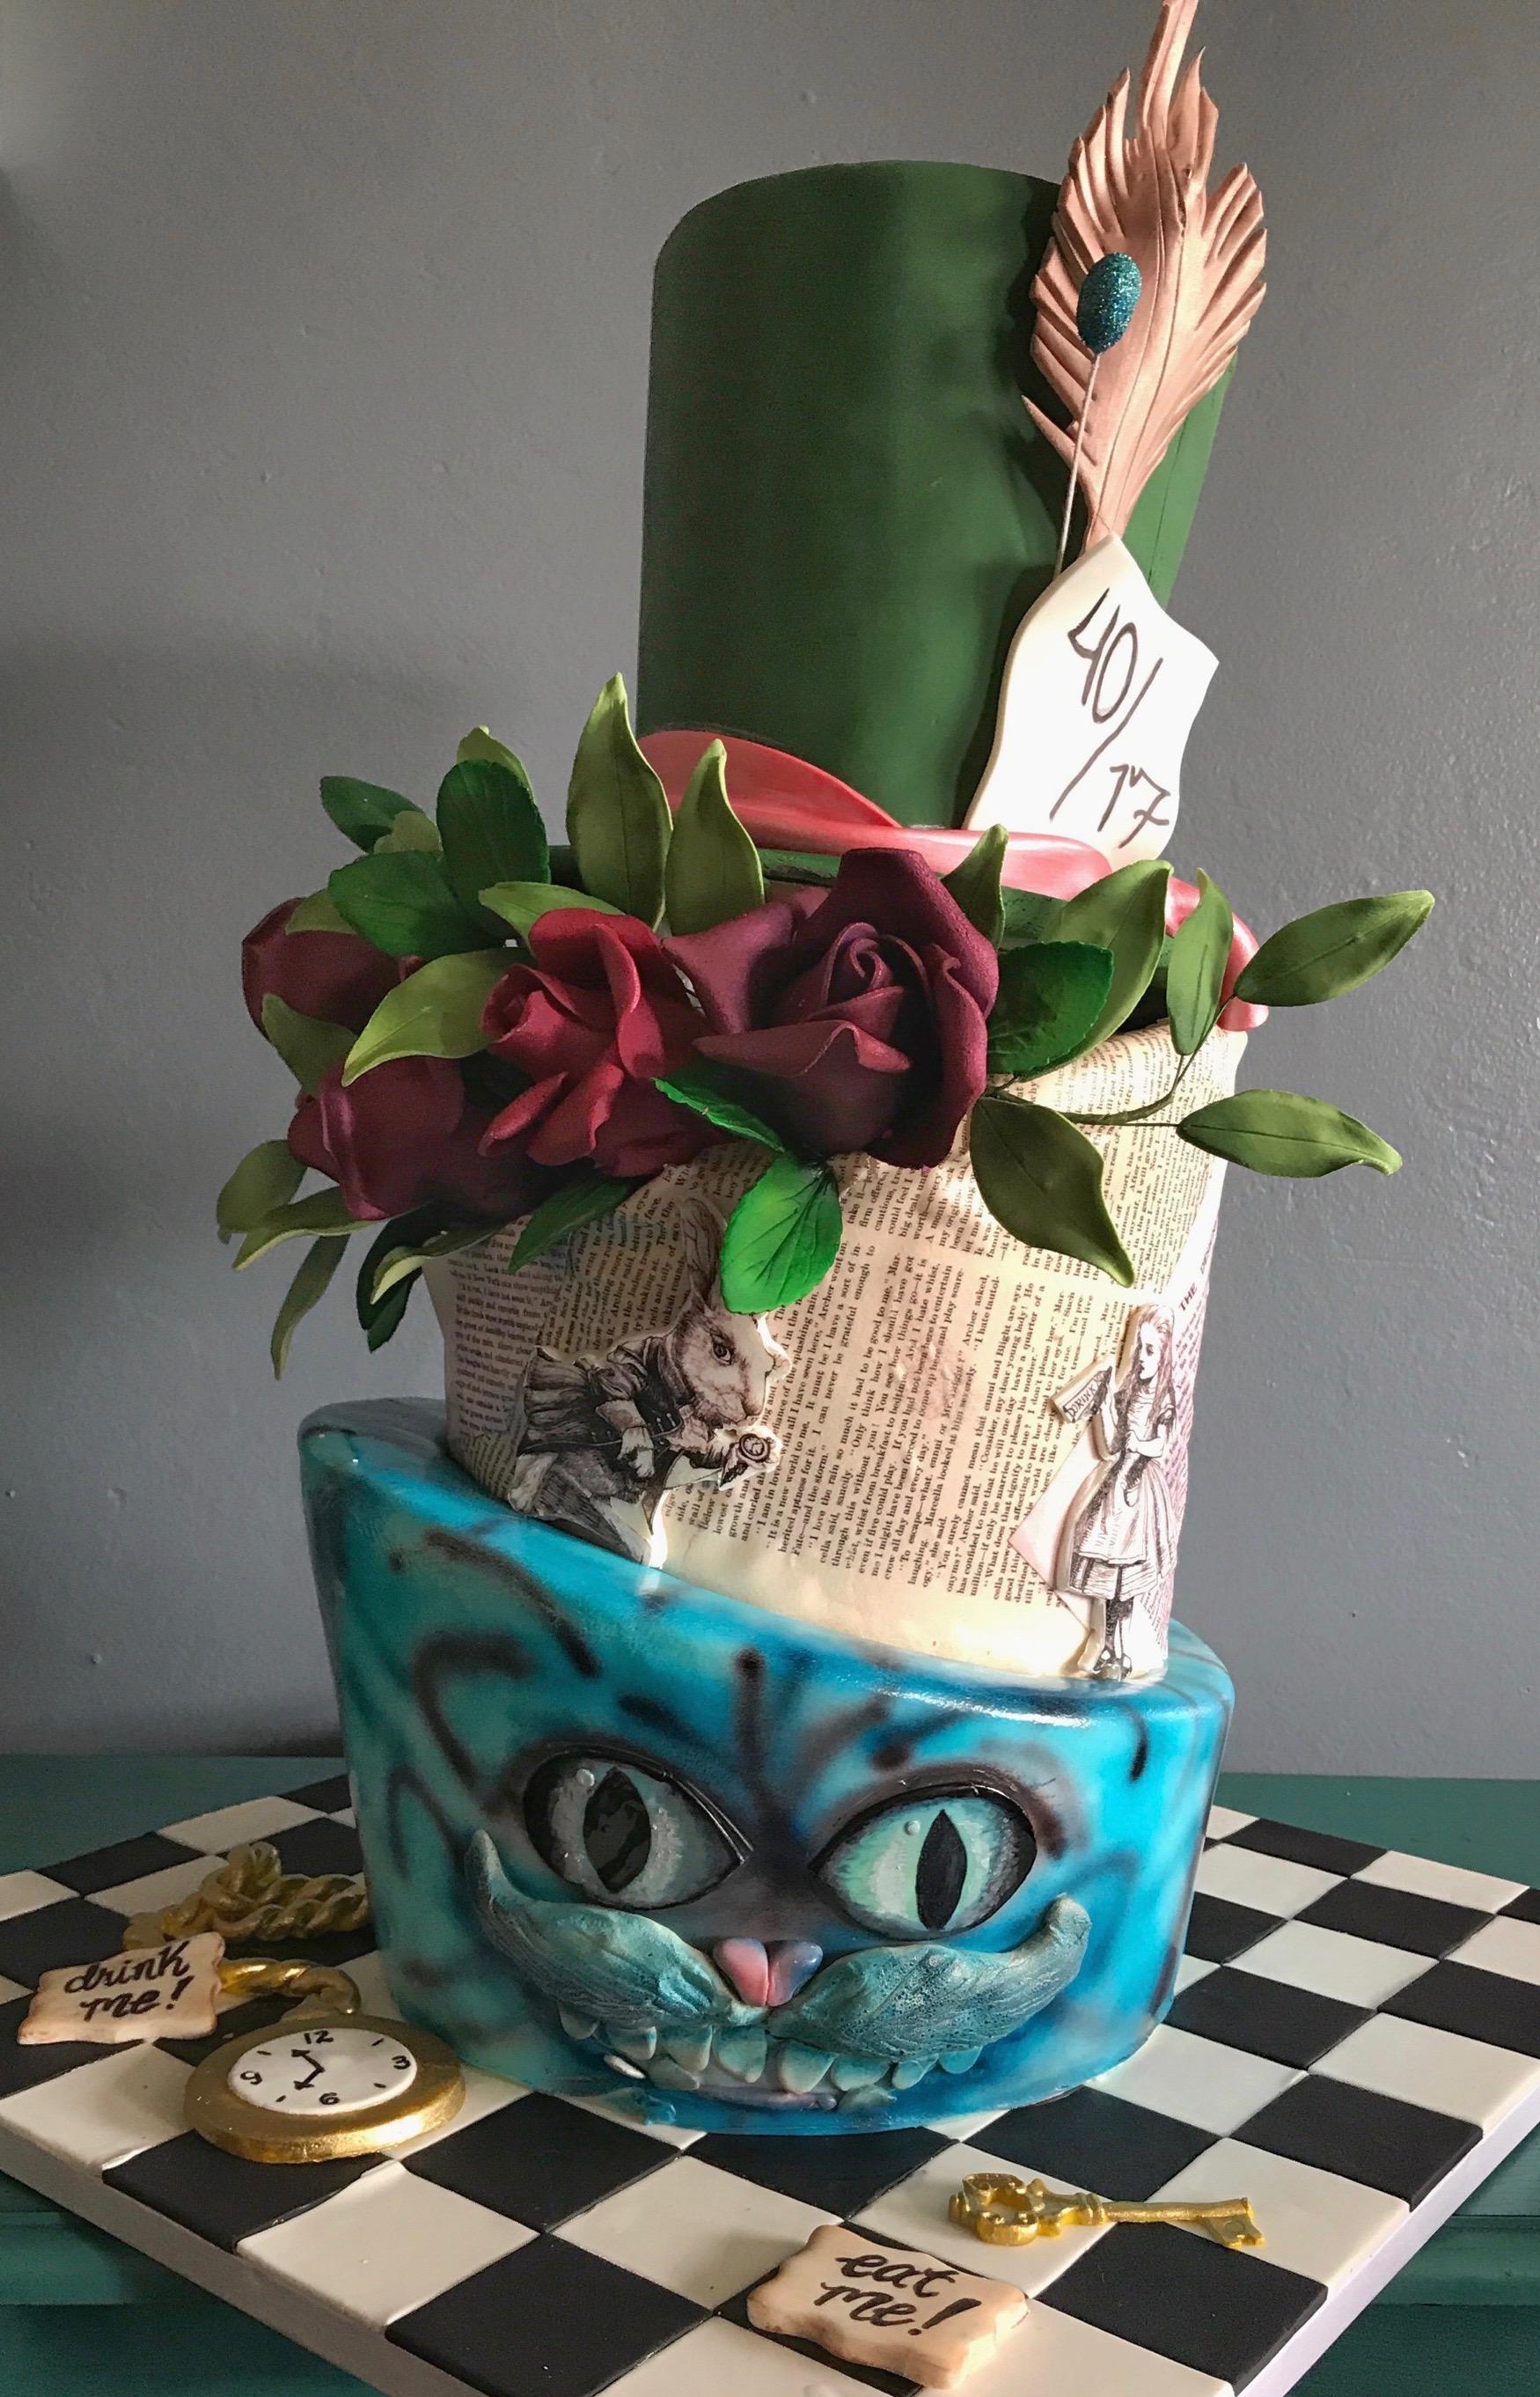 Topsy Turvy green alice in wonderland cake